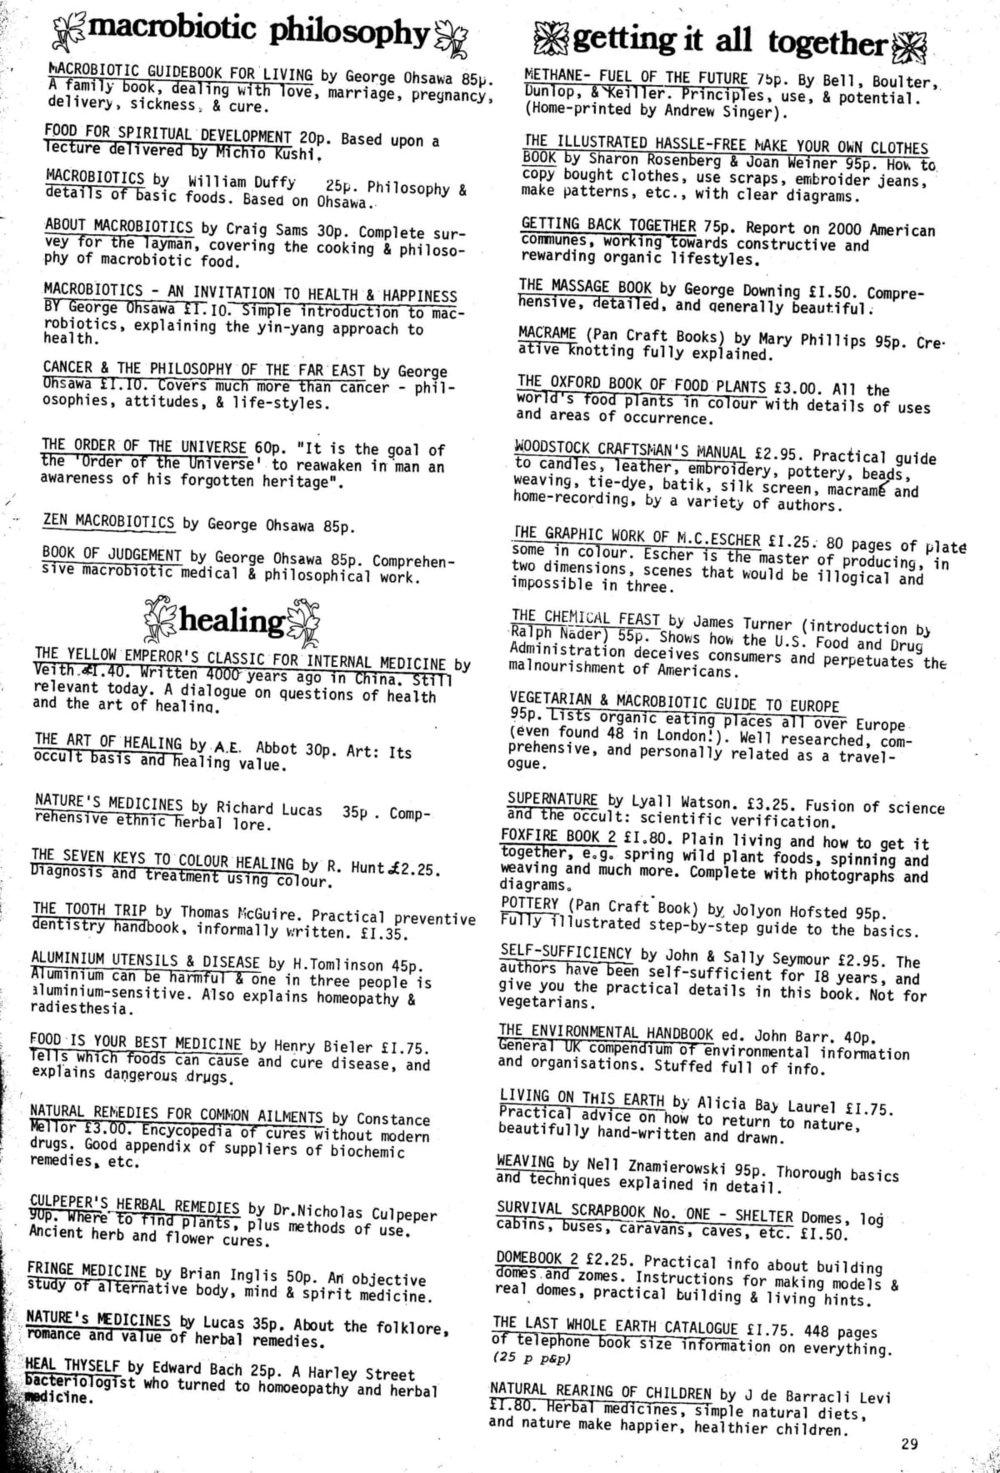 seed-v3-n4-april1974-29.jpg